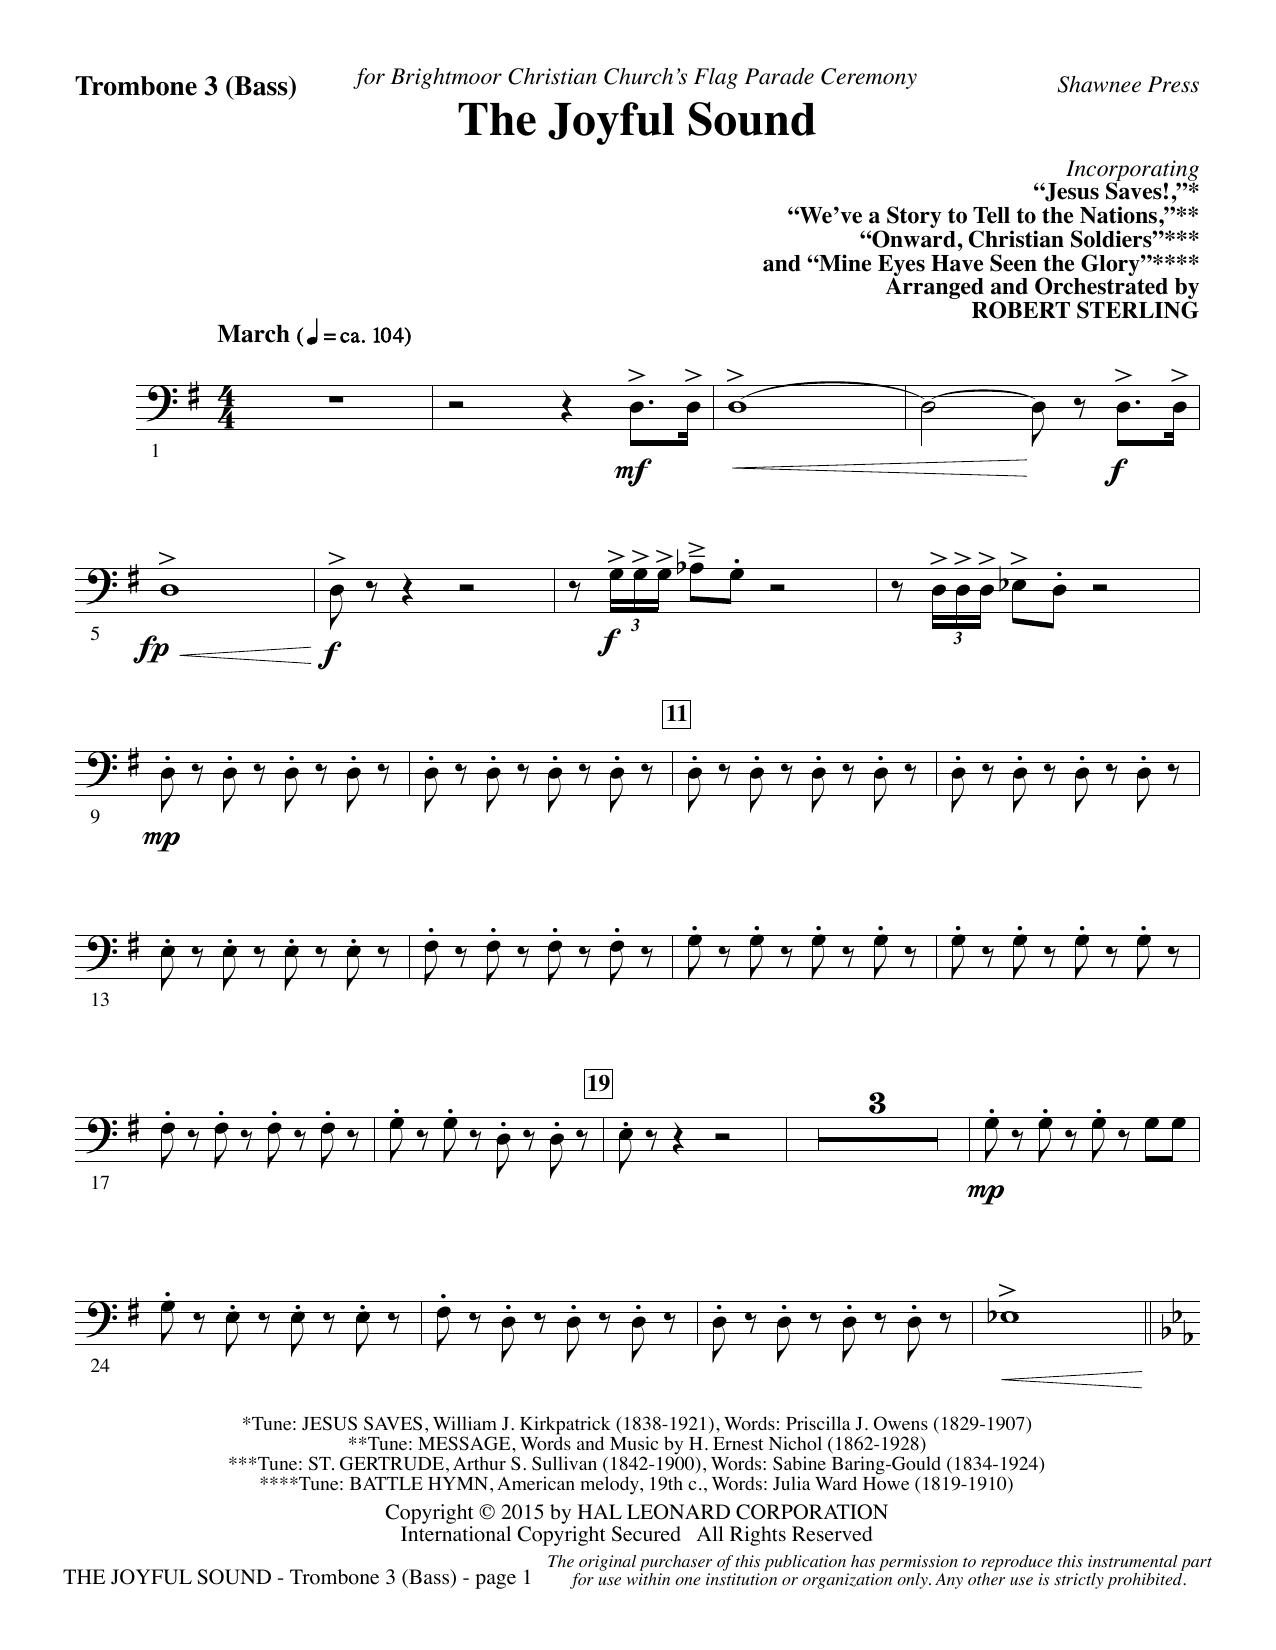 The Joyful Sound - Trombone 3 (Bass) sheet music